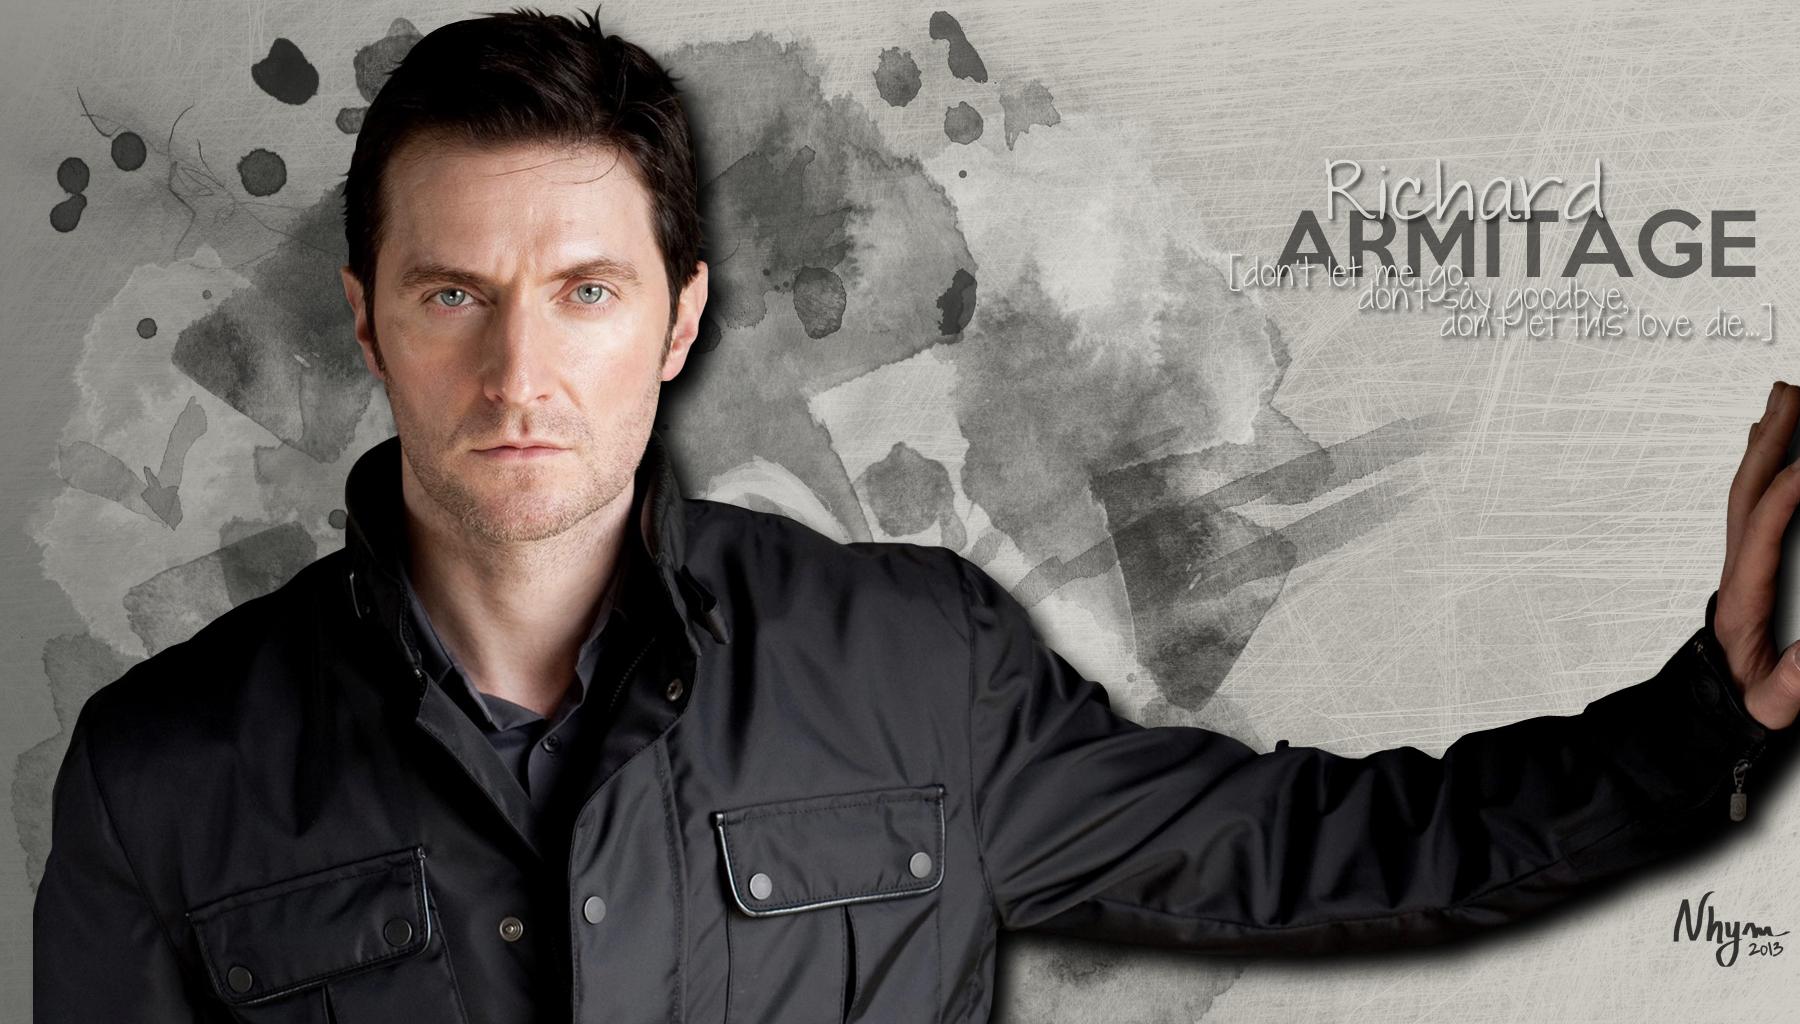 Richard Armitage Wallpaper   Richard Armitage Photo 33483127 1800x1024